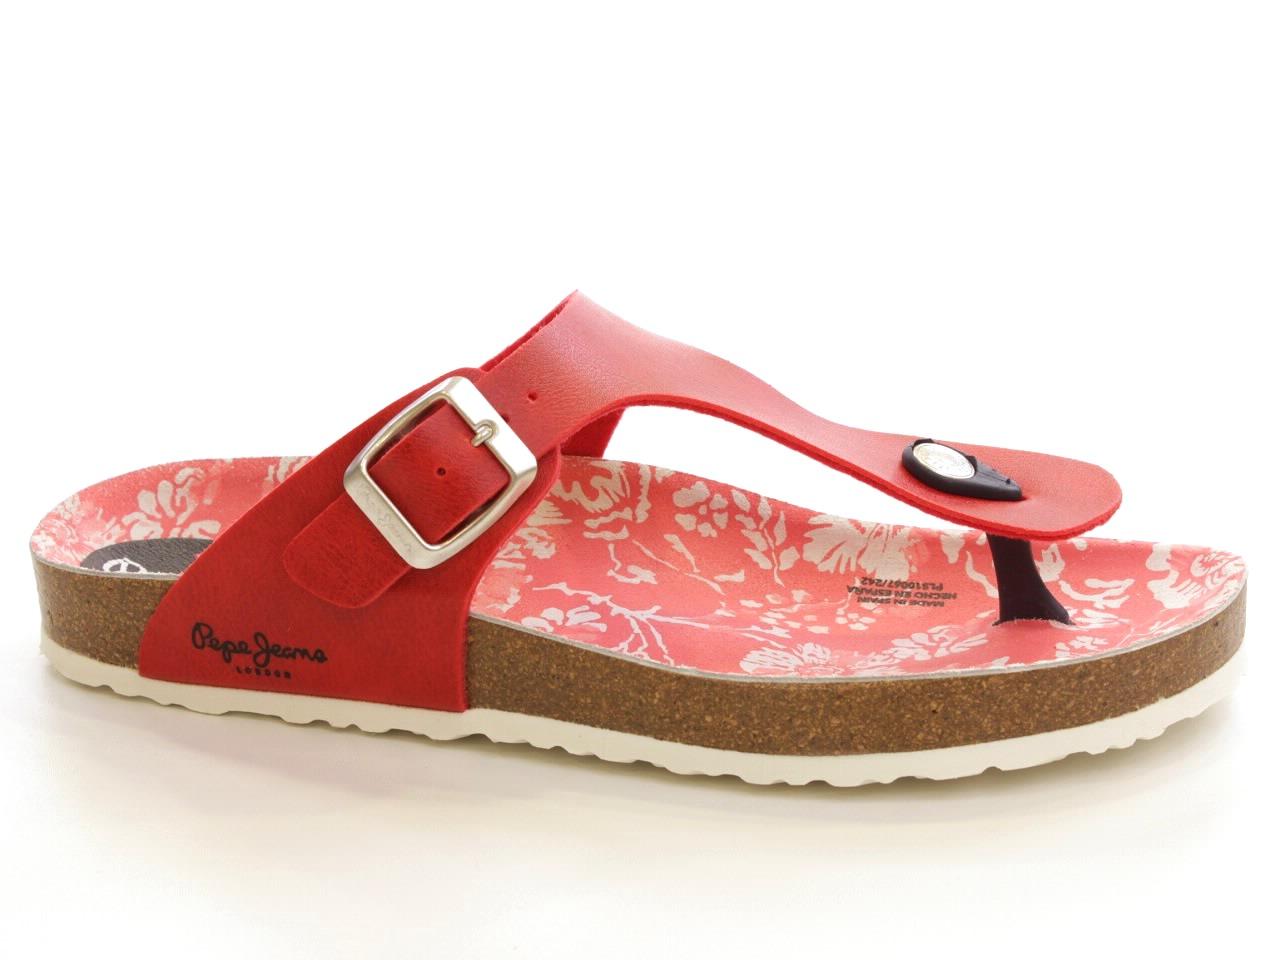 Sandales Plates Pepe Jeans - 608 PLS10067